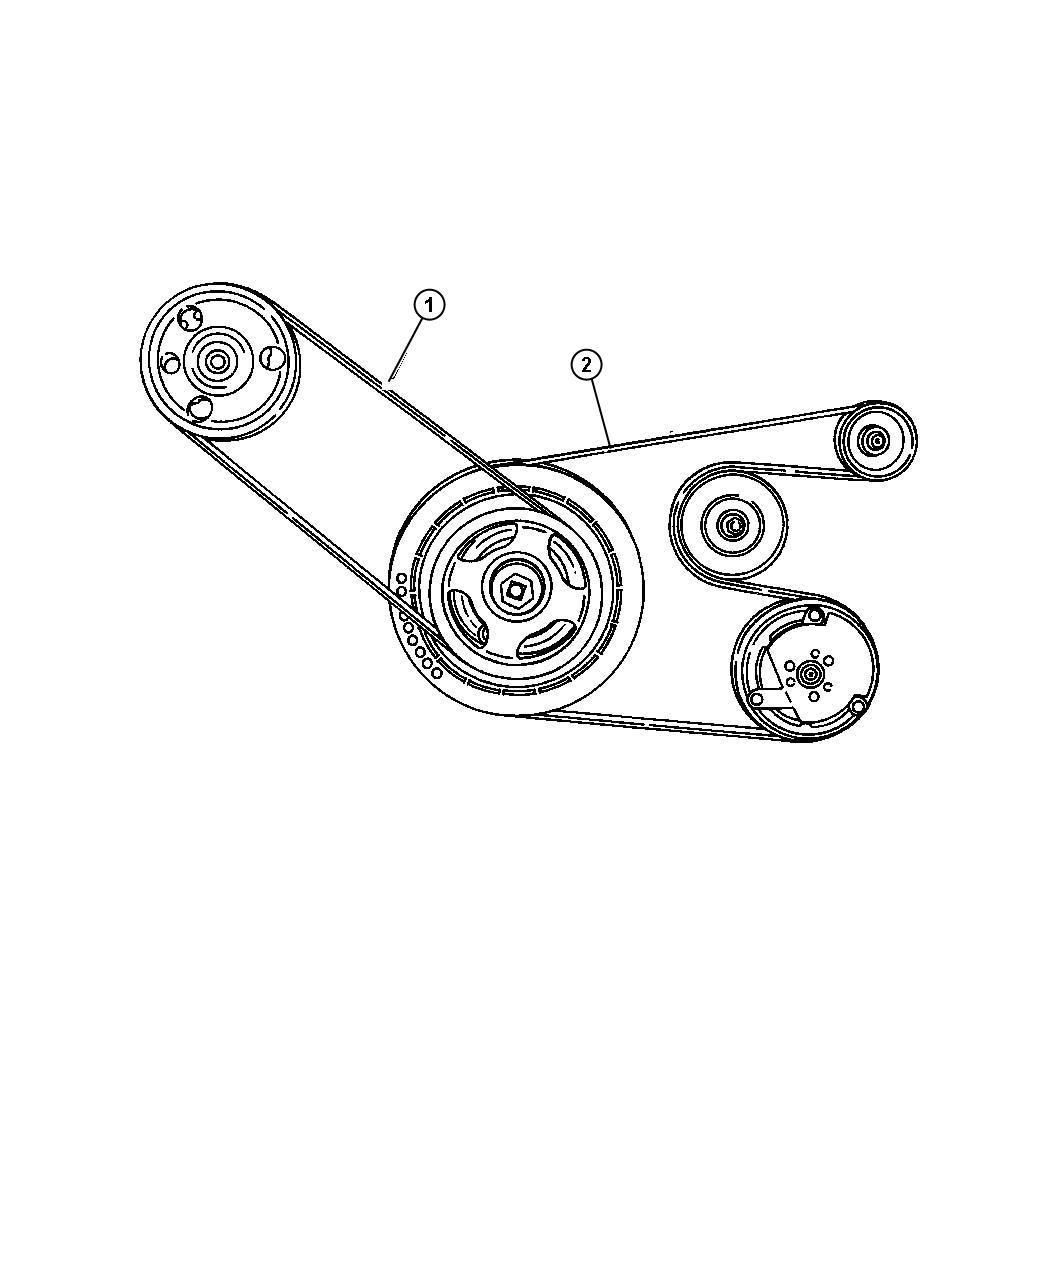 Chrysler Cirrus Serpentine Belt Removal